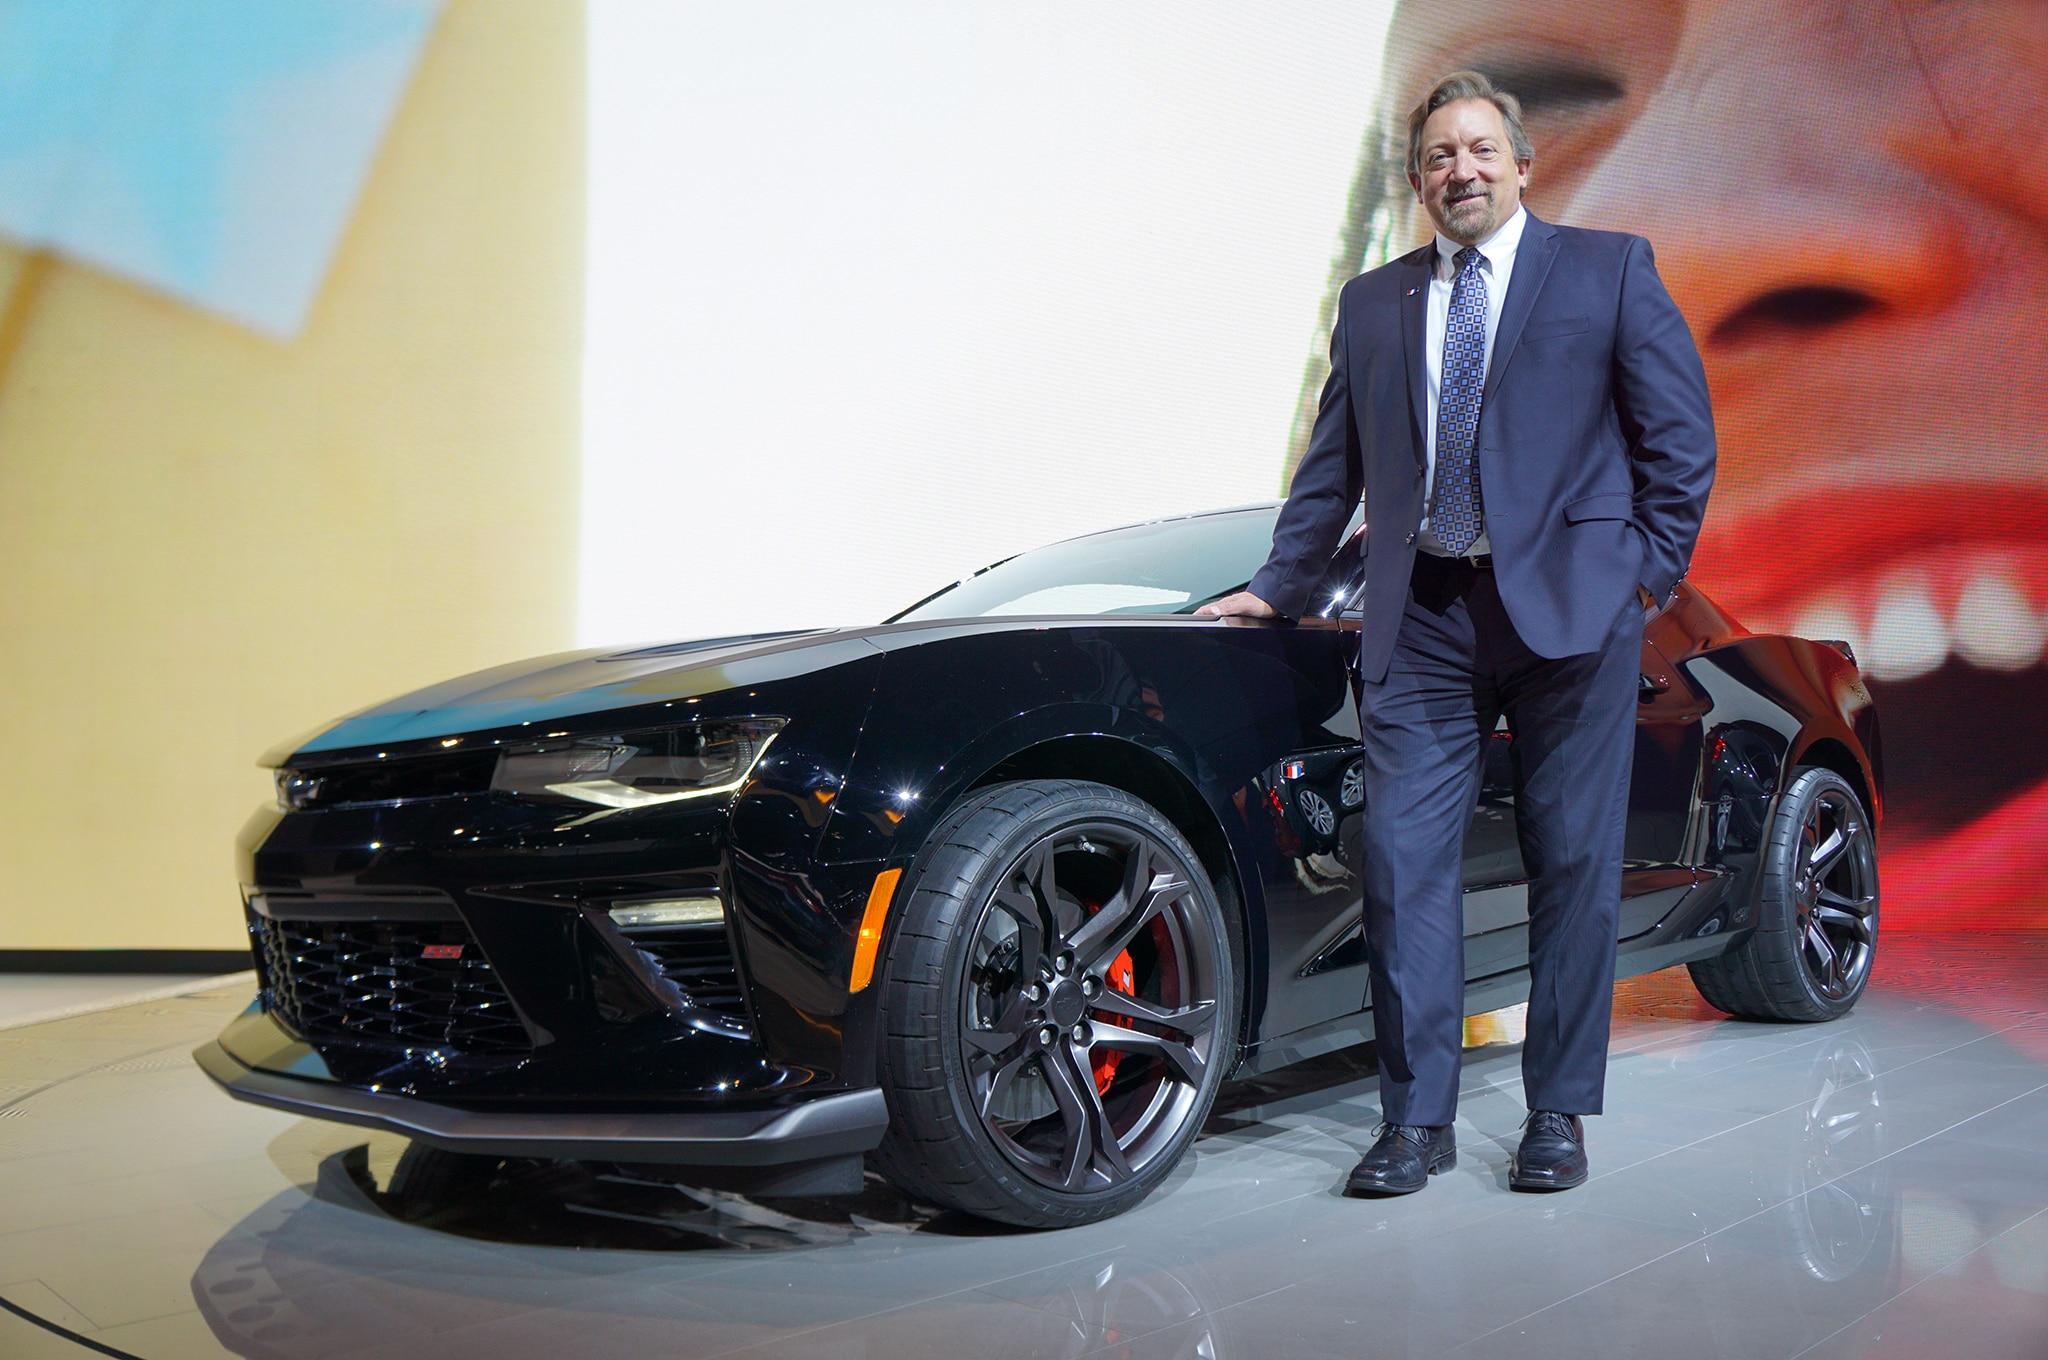 2017 Chevrolet Camaro SS 1LE And Al Oppenheiser